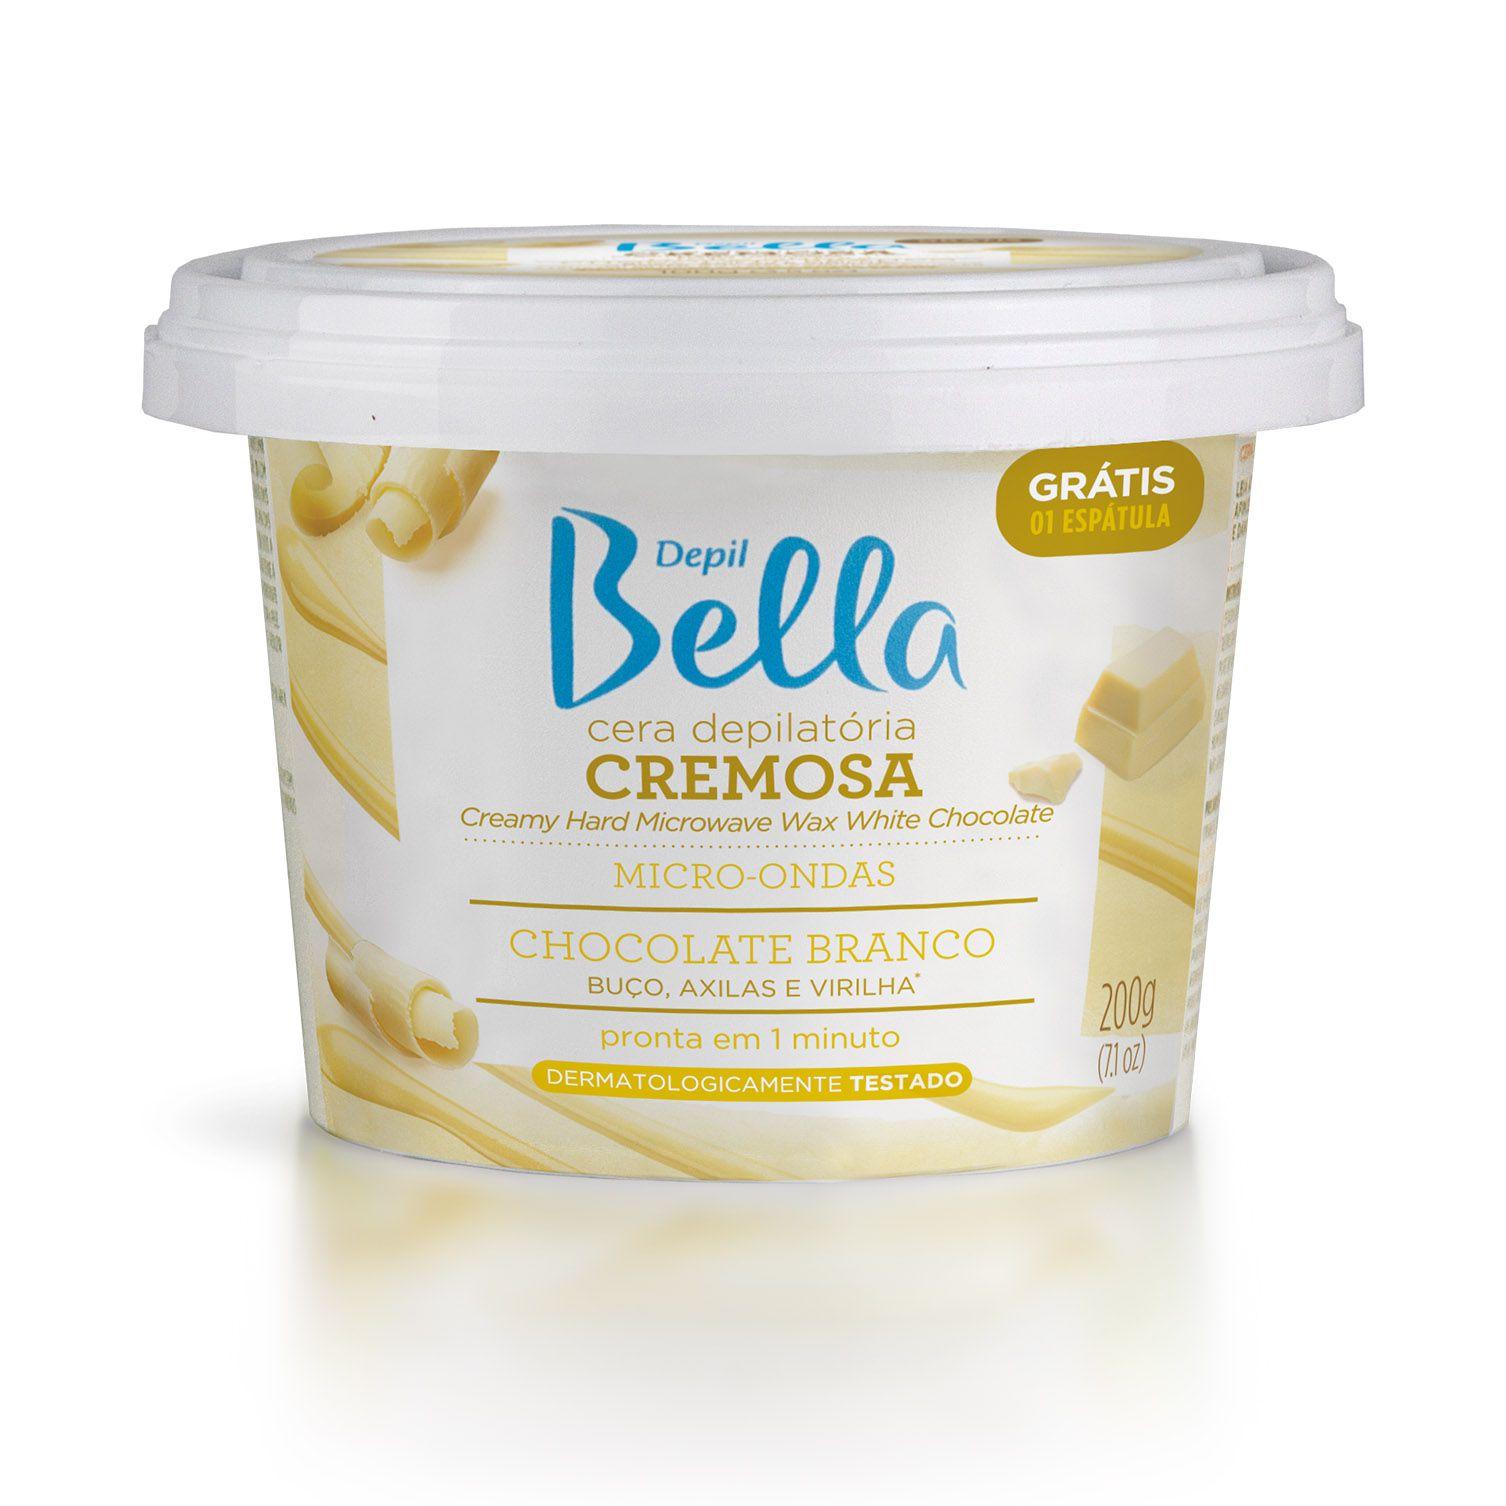 Cera Depil Bella Cremosa Para Micro-ondas Chocolate Branco 200 g